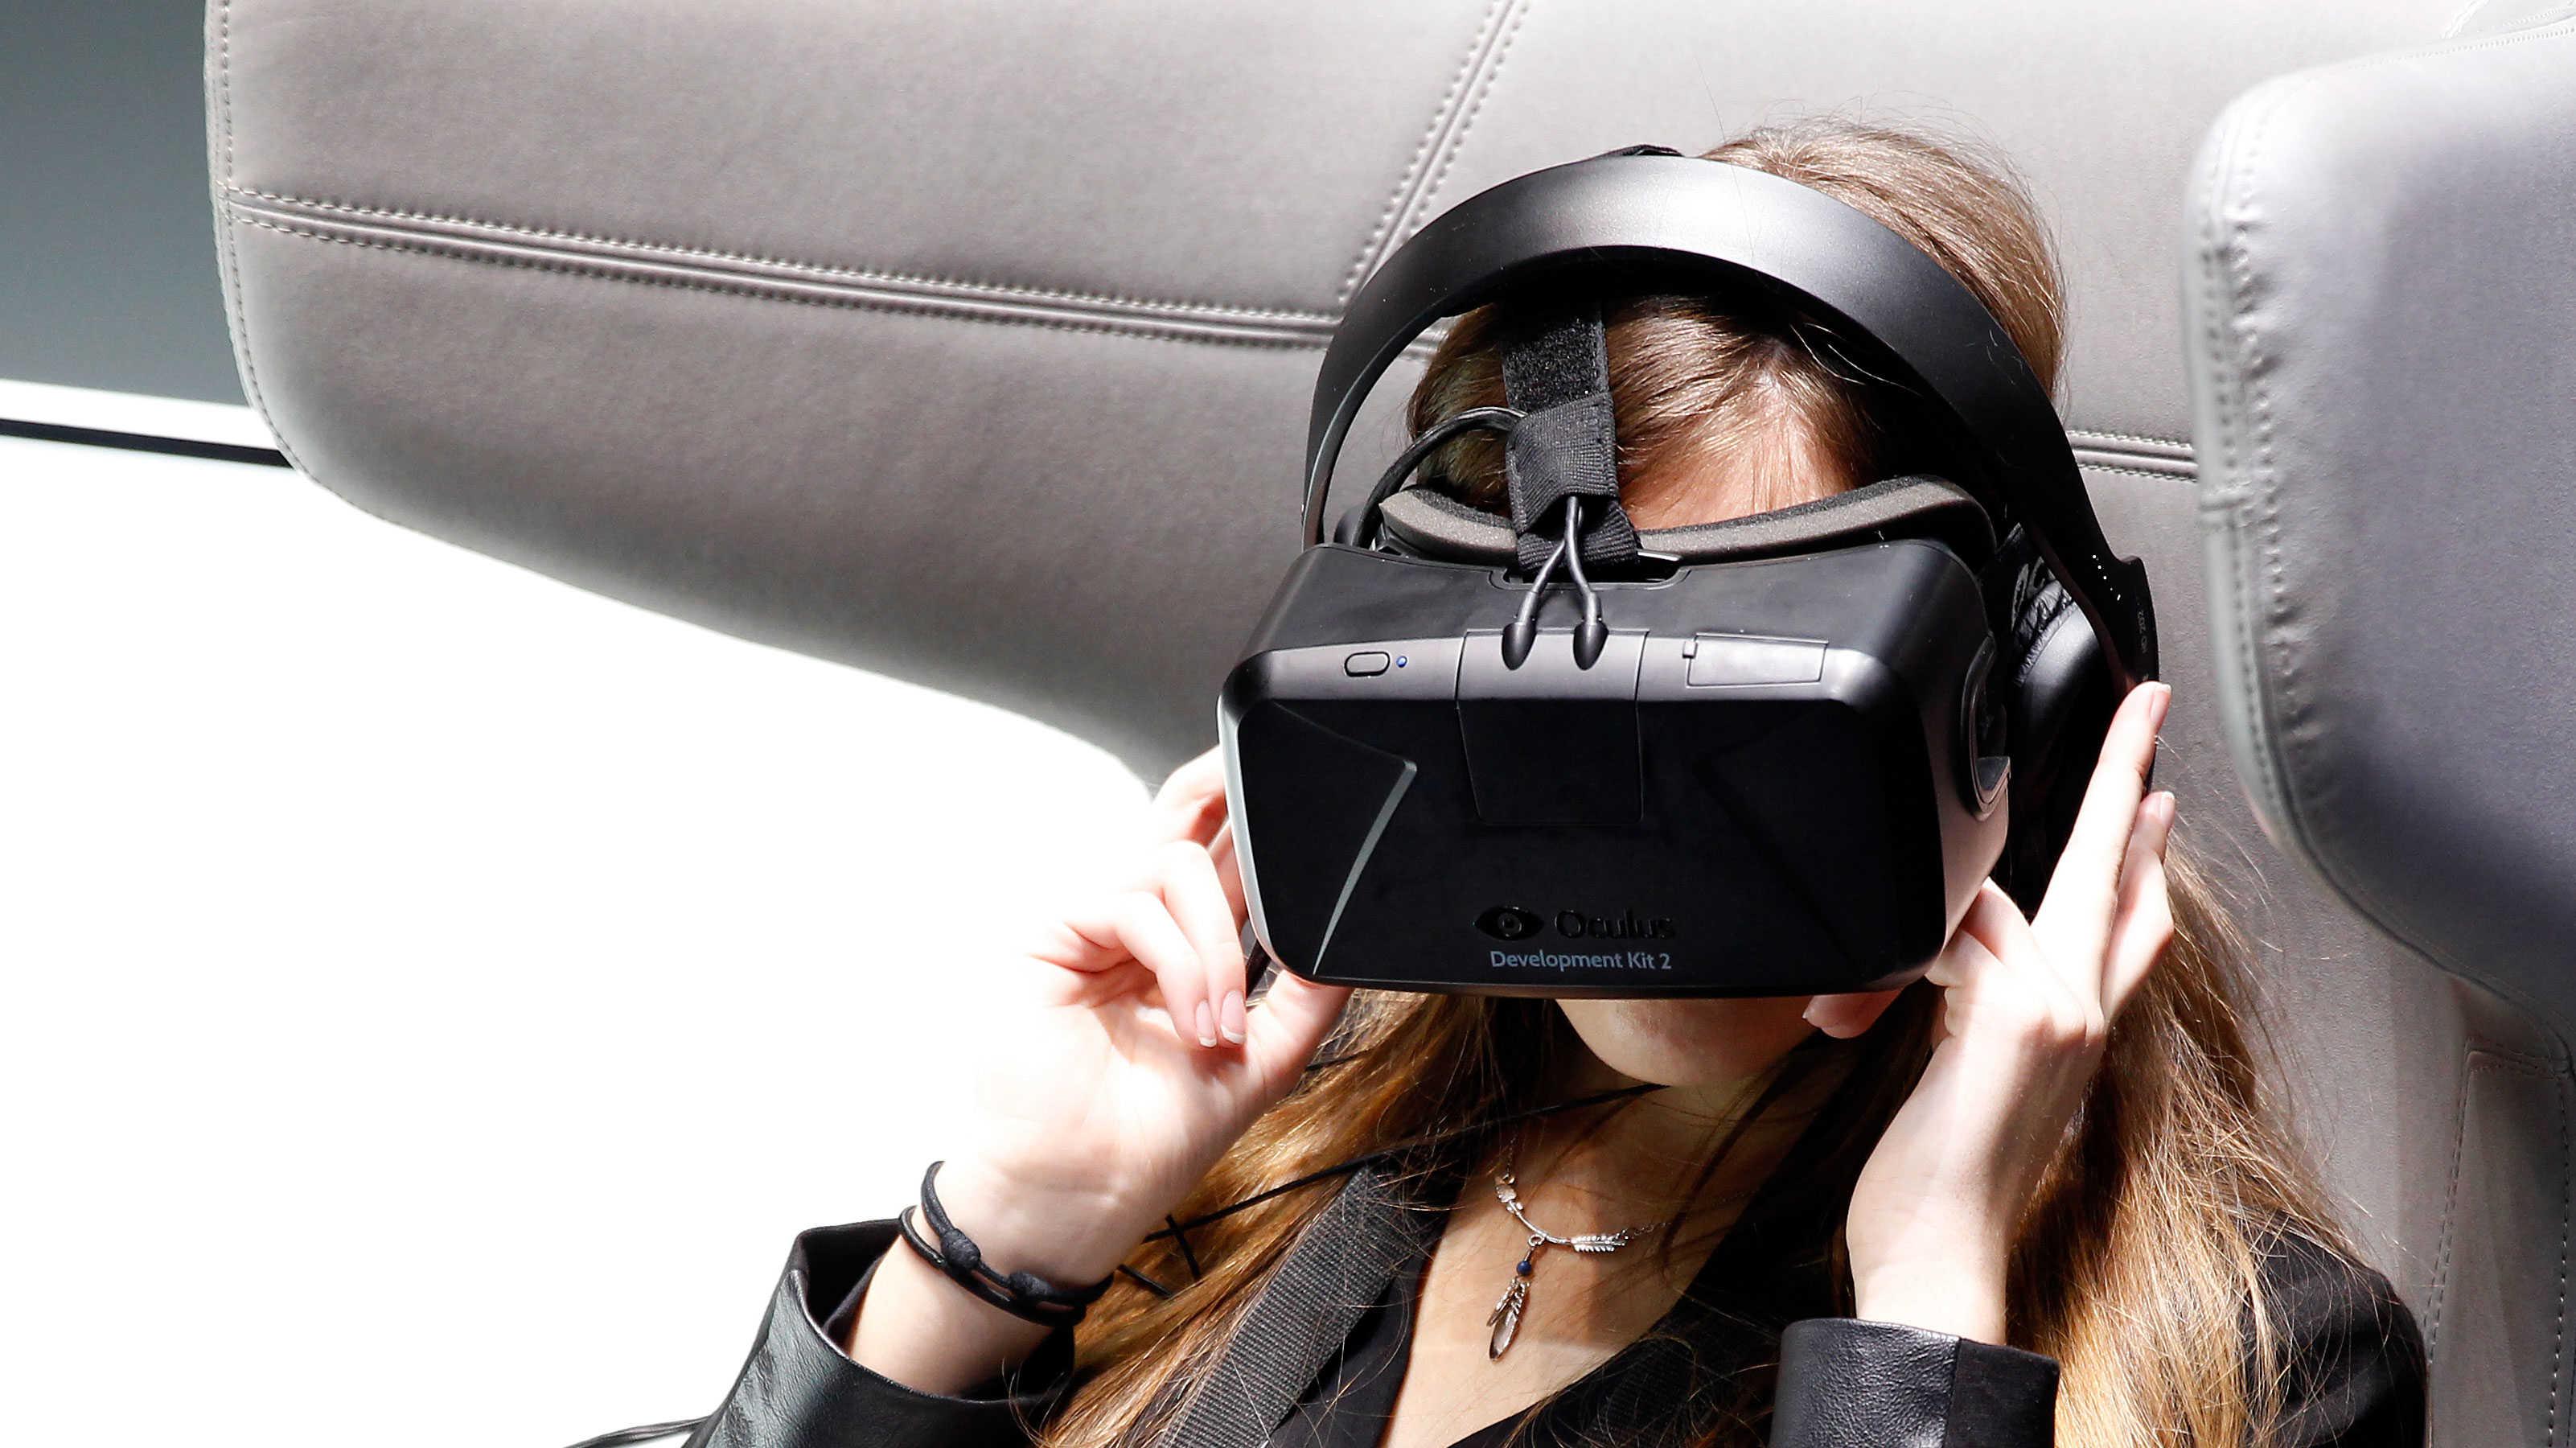 VR 普及之路漫長 全球不足 1% 的個人電腦有力運行 VR - UNWIRE.PRO